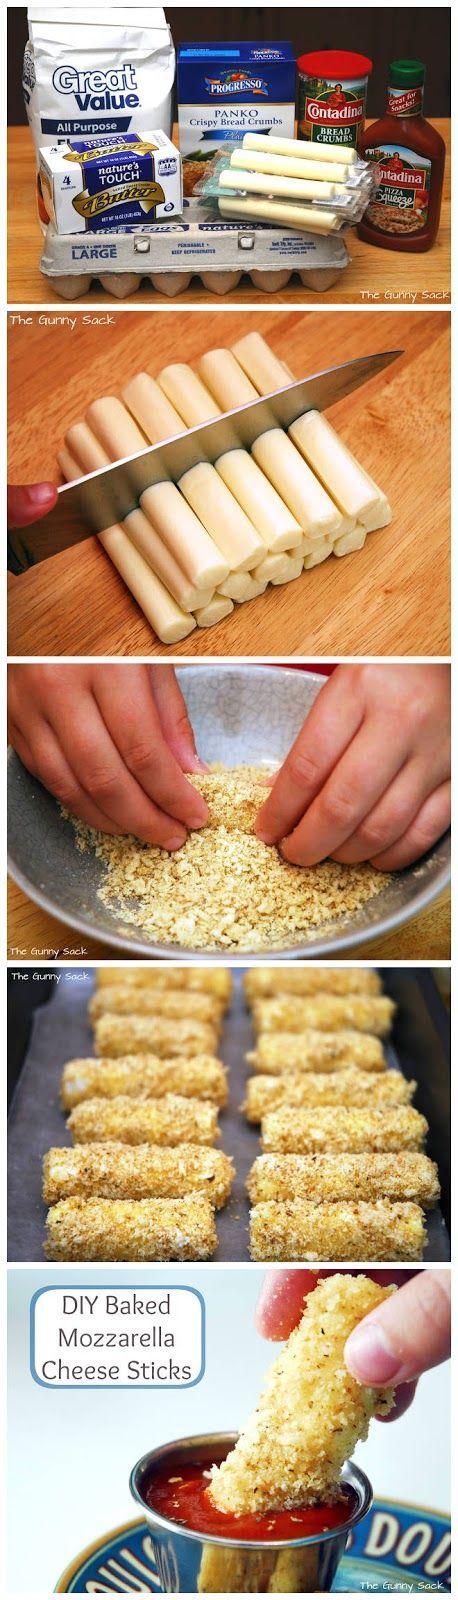 Baked Mozz Sticks  http://www.recipebest.com/2013/07/baked-mozzarella-cheese-sticks-recipe.html